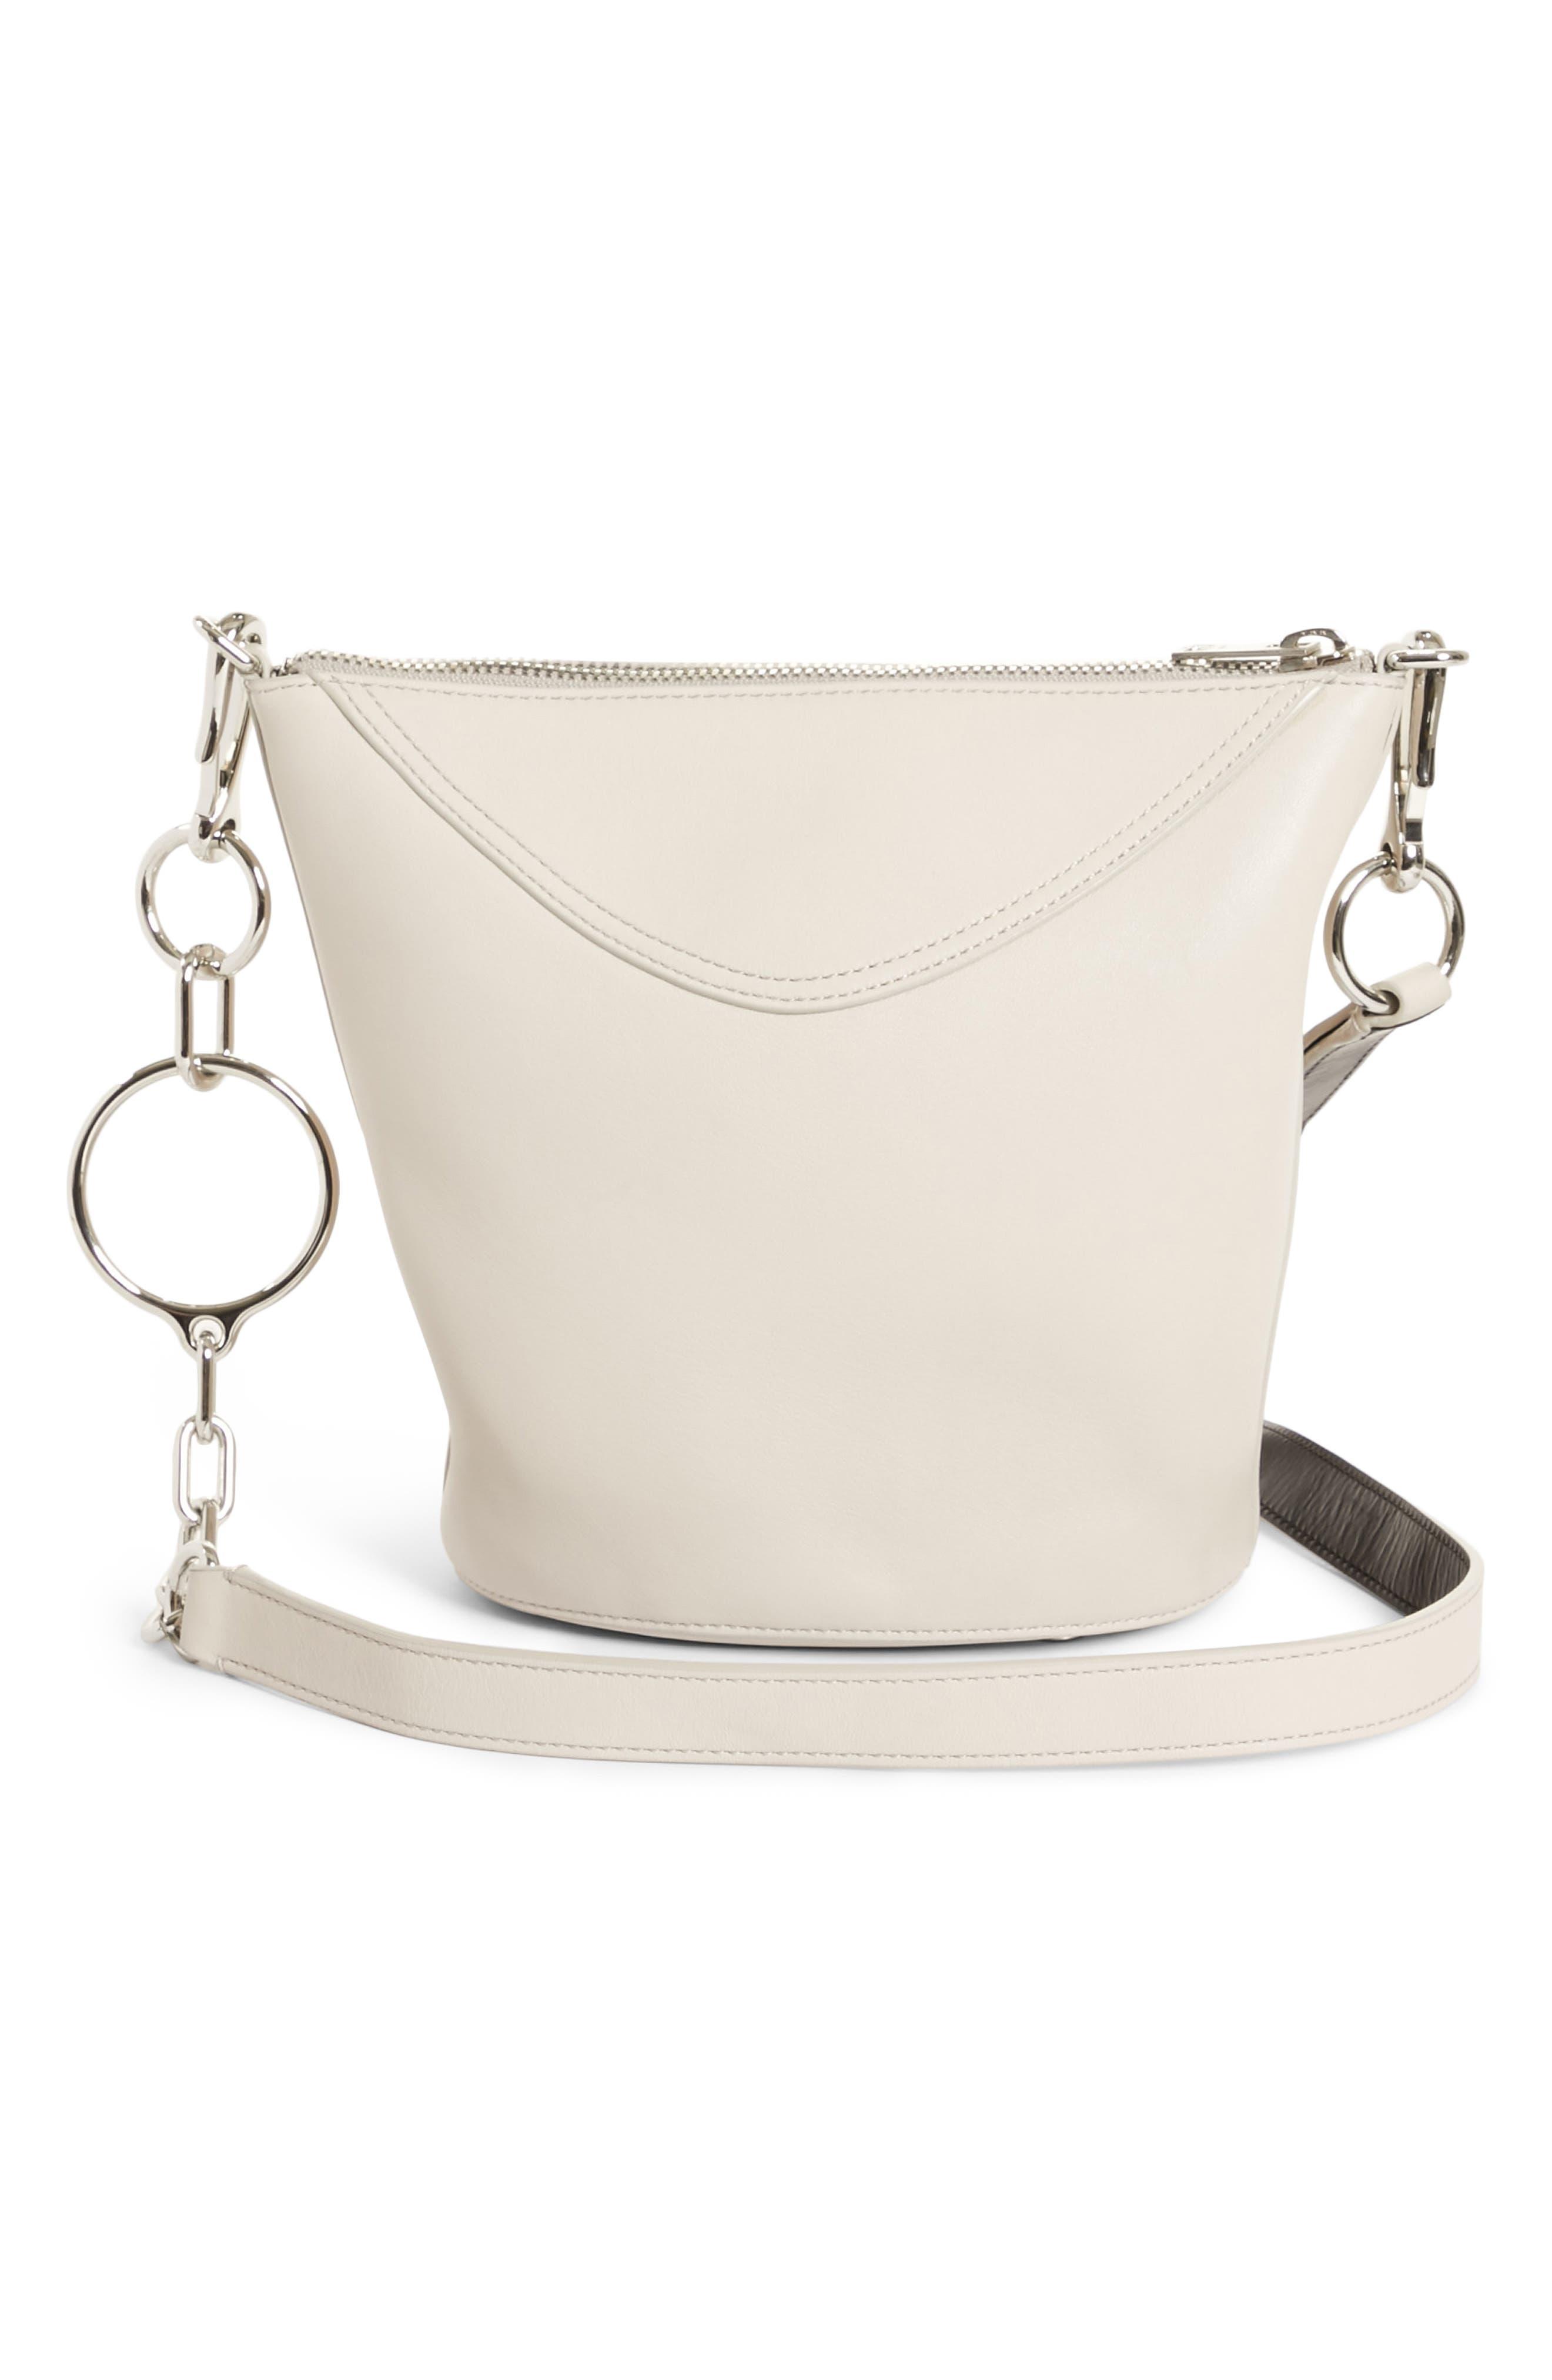 Main Image - Alexander Wang Ace Leather Bucket Bag